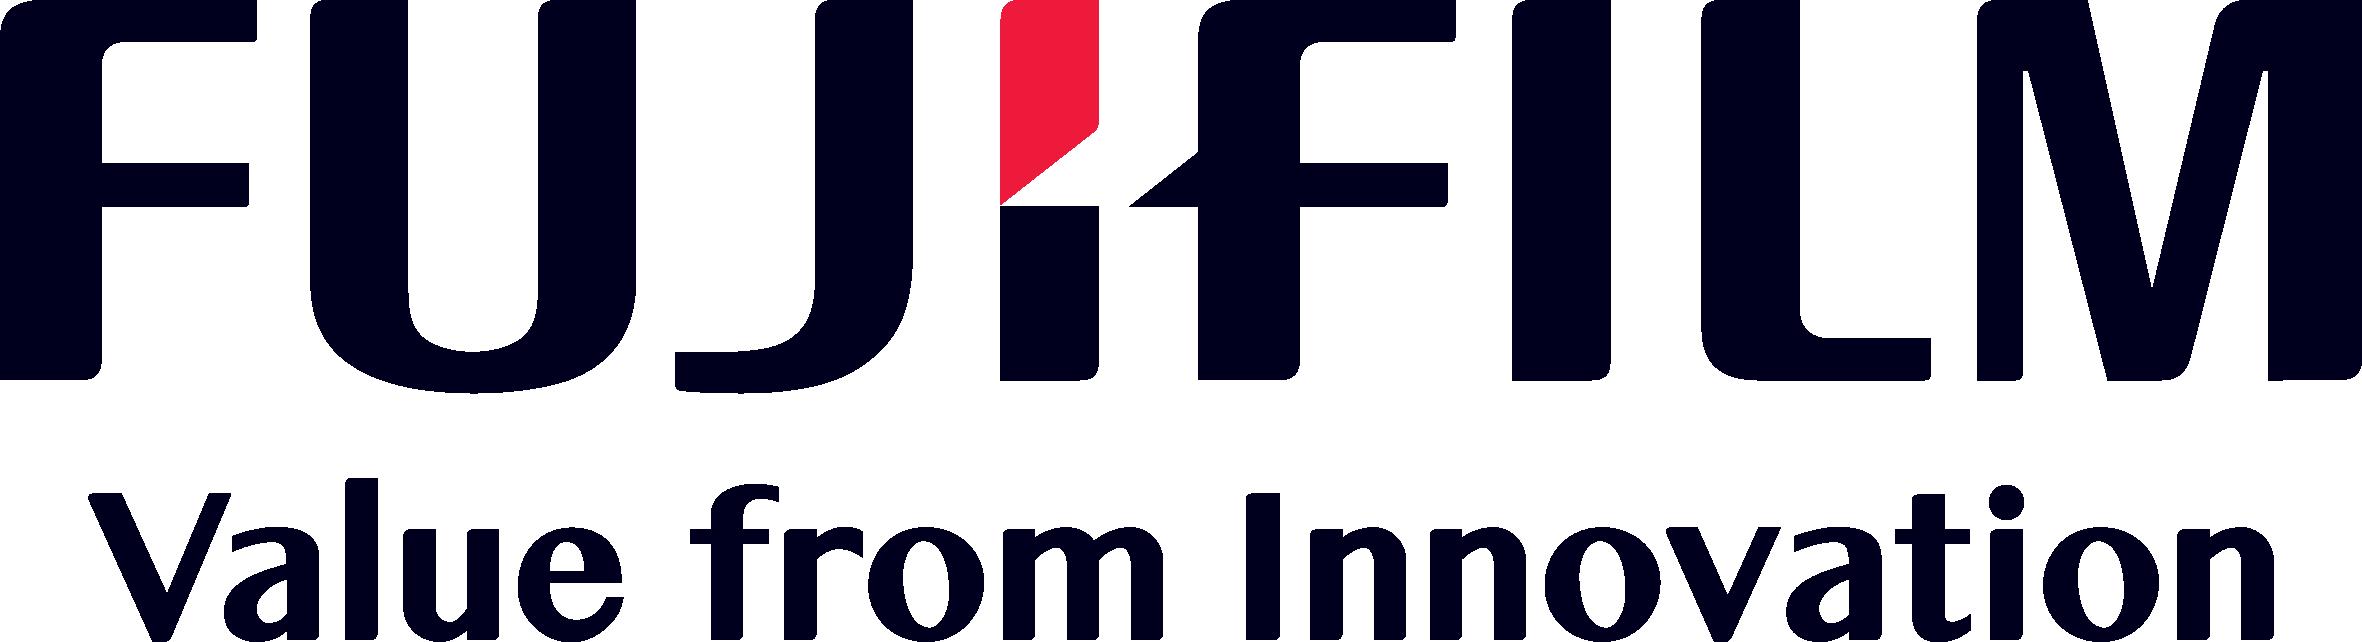 FUJIFILM_VFI_hires-rich-black